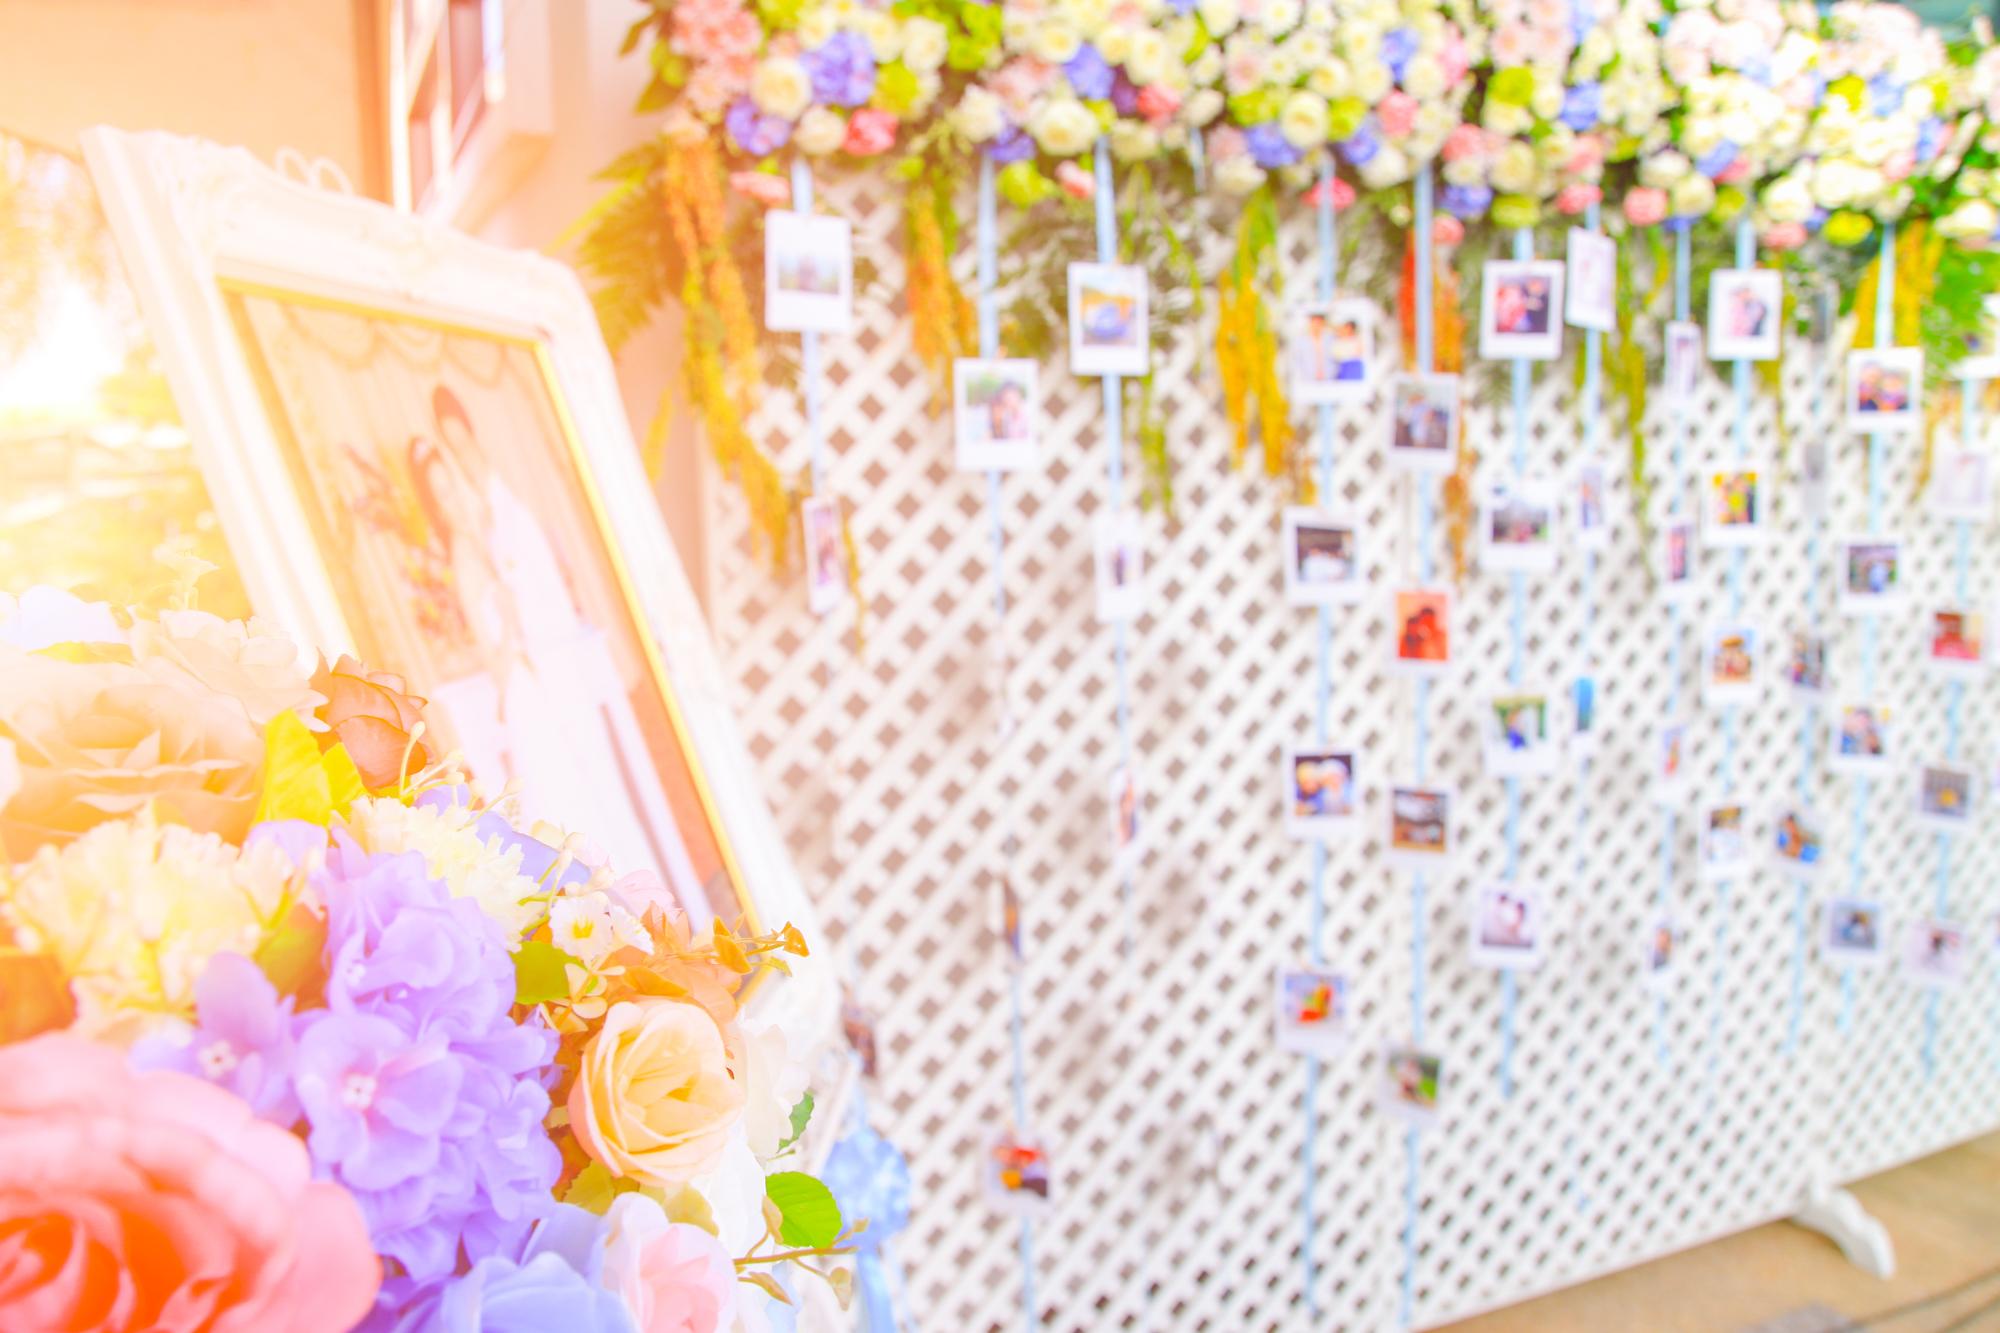 Blur Wedding party flower decoration for background.